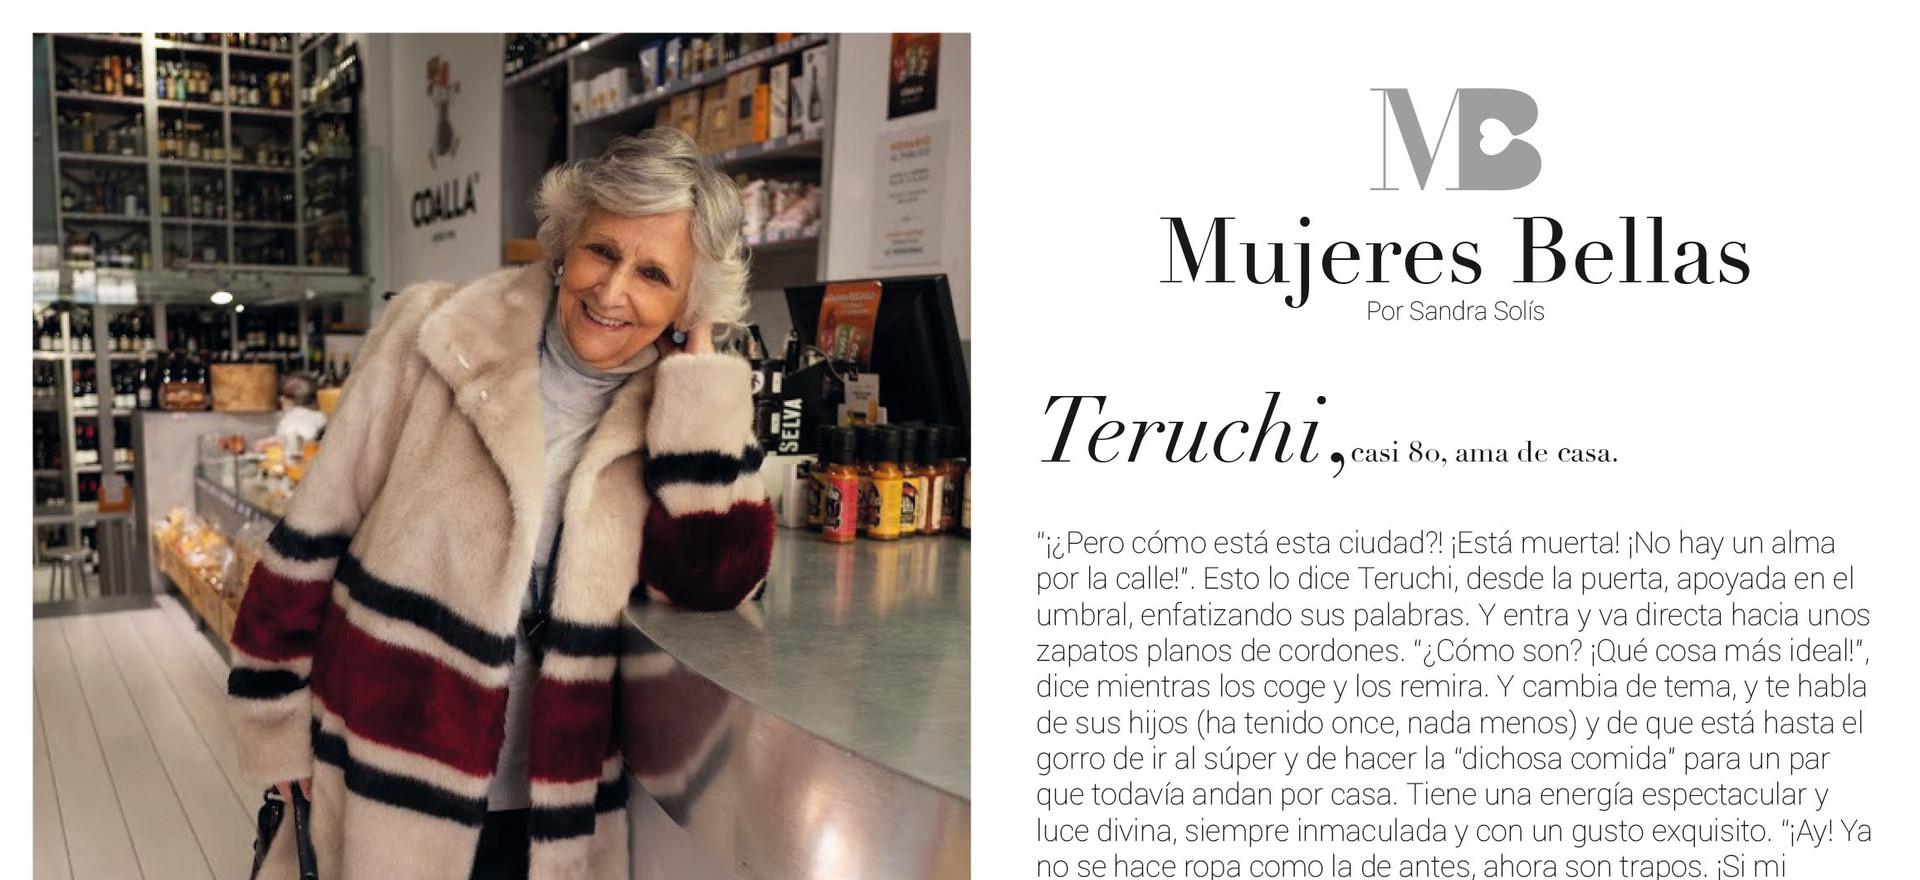 Mujeres Bellas A4_teruchi.jpg